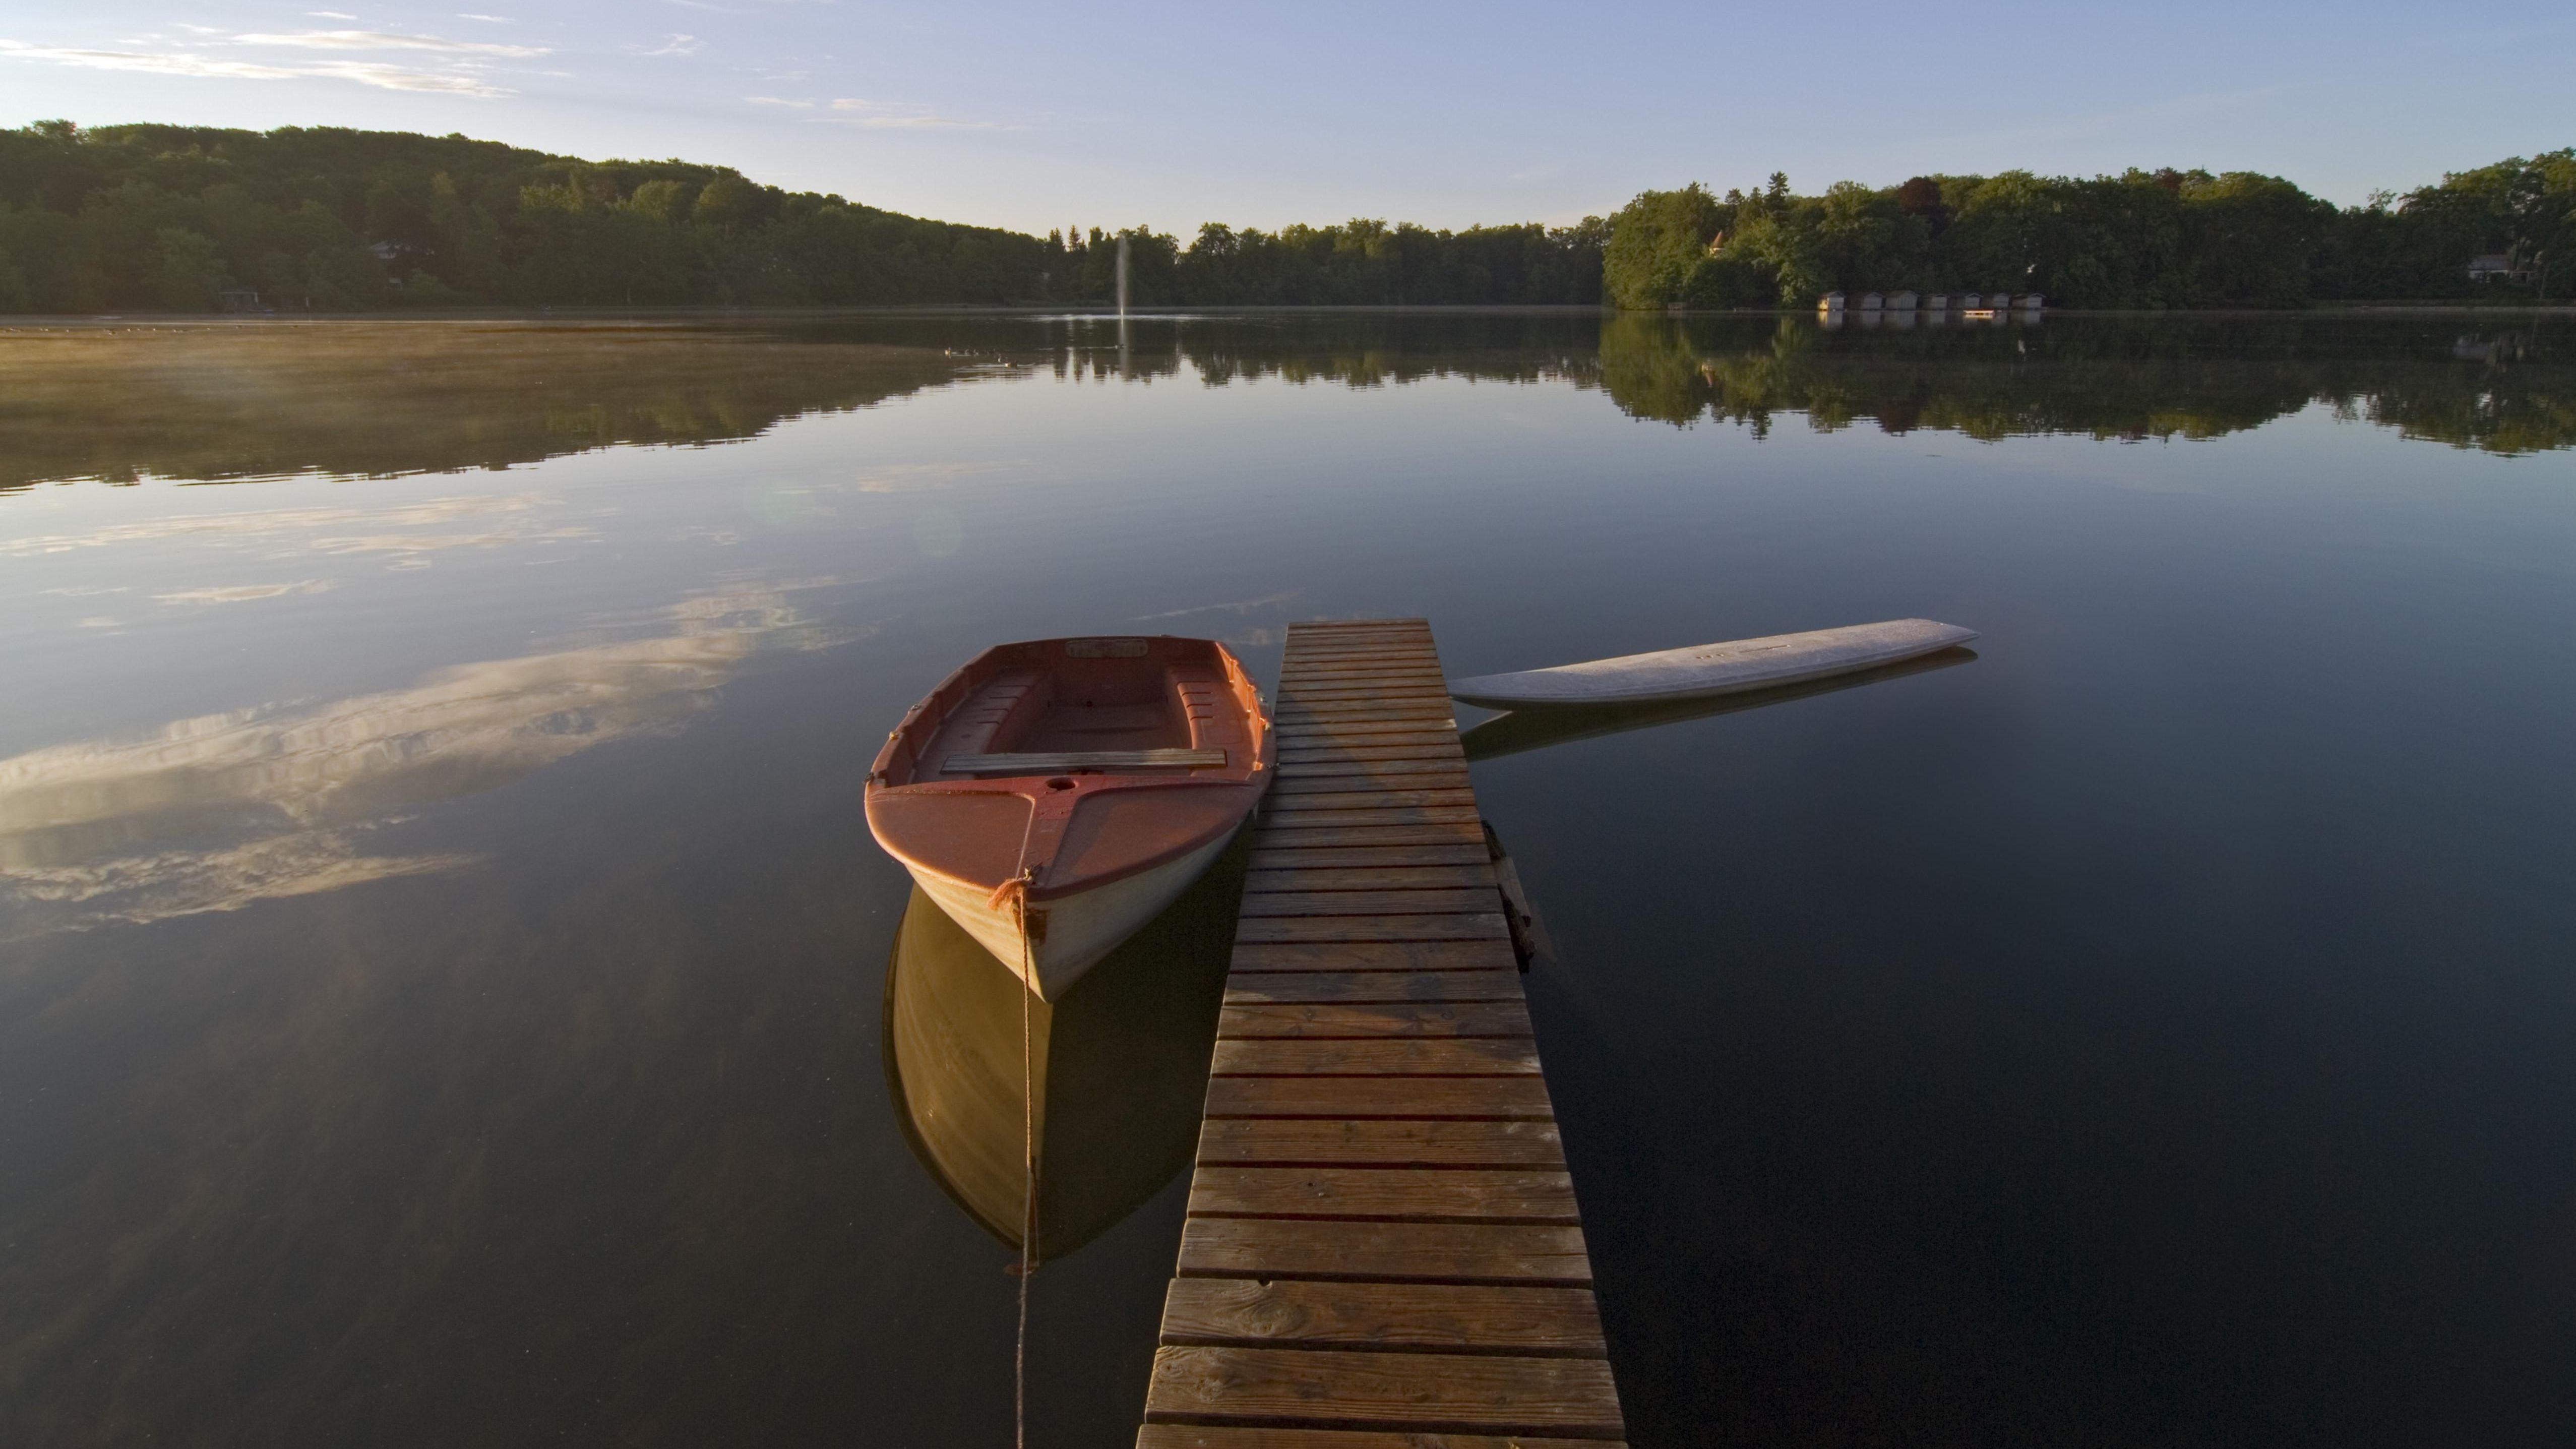 Der Weßlinger See im Landkreis Starnberg (Archivbild)